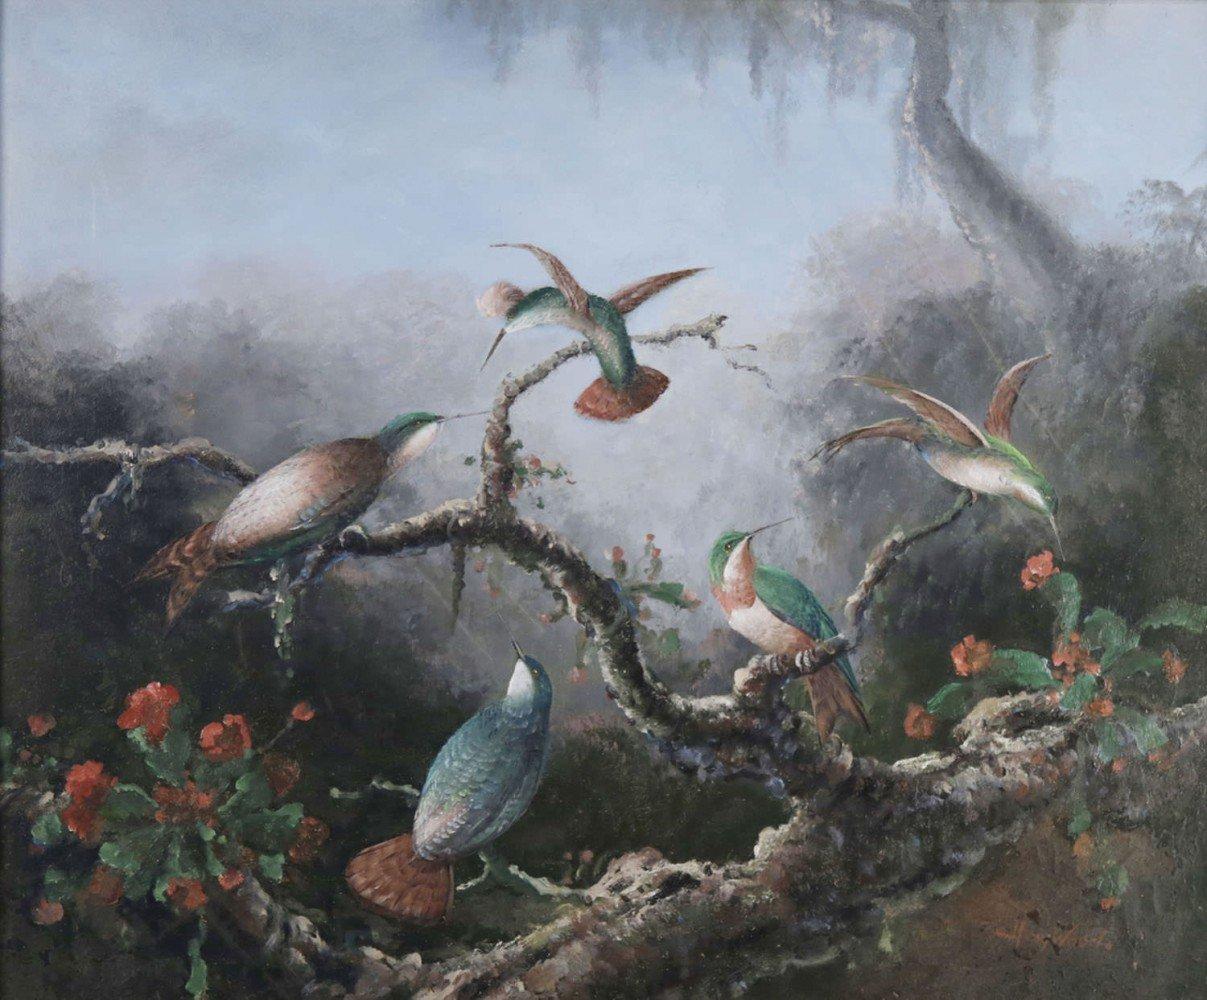 20thc. School, Hummingbirds in a Lush Landscape by 20th Century School